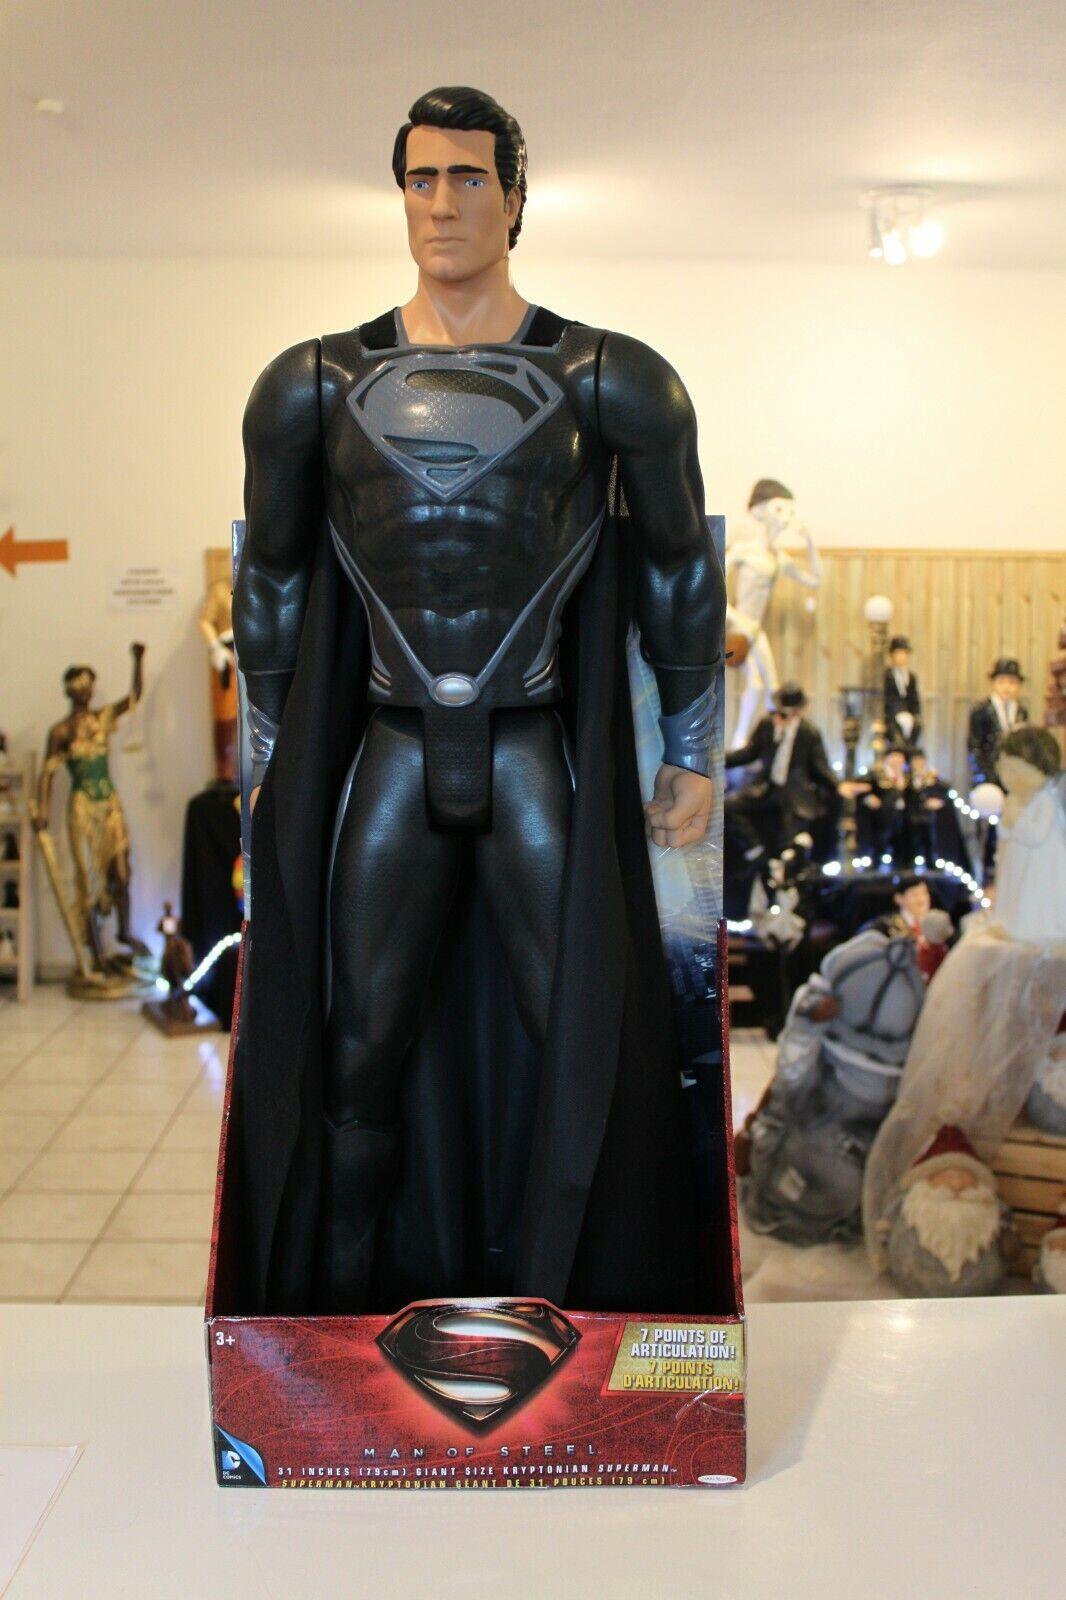 JAKKS PACIFIC SUPERMAN OF OF OF STEEL schwarz SUIT XXL ACTION FIGUR ca. 79 cm( ) -NEU- 85a27c